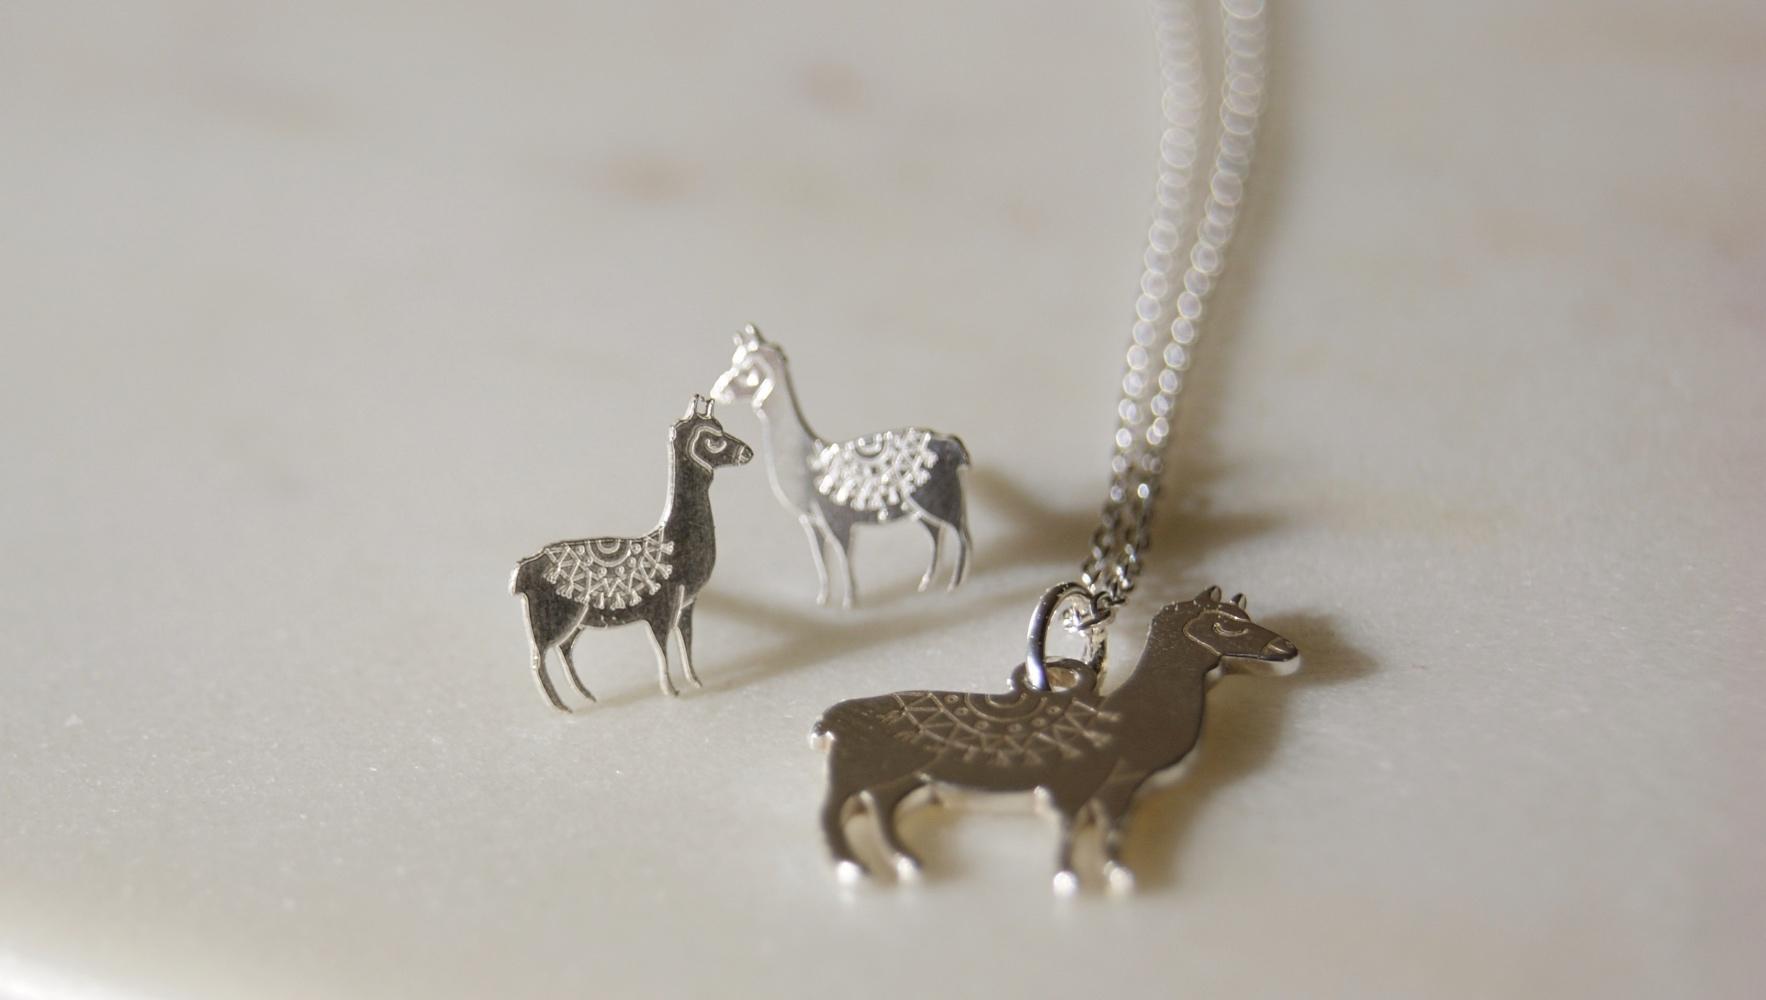 a77330782 llama-earrings-necklace-homeofjuniper-sterling-silver-jewellery